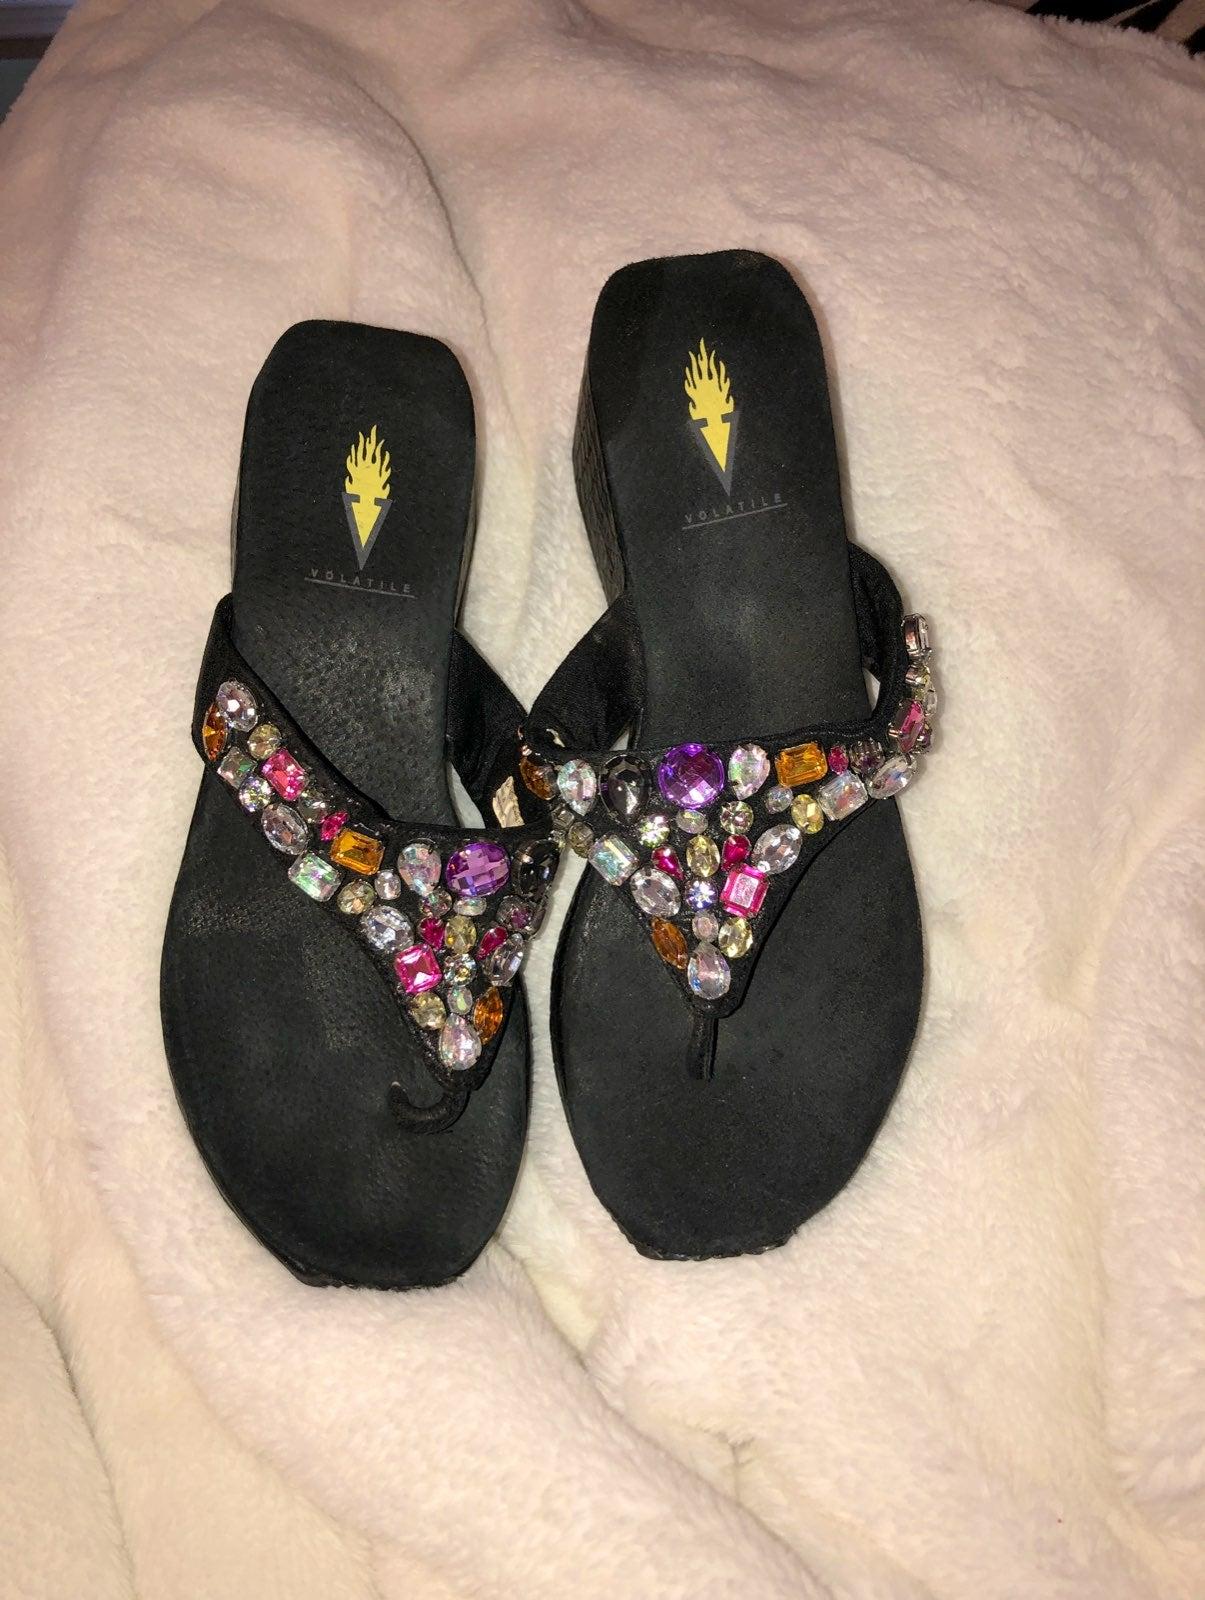 Volatile women's beaded leather sandals